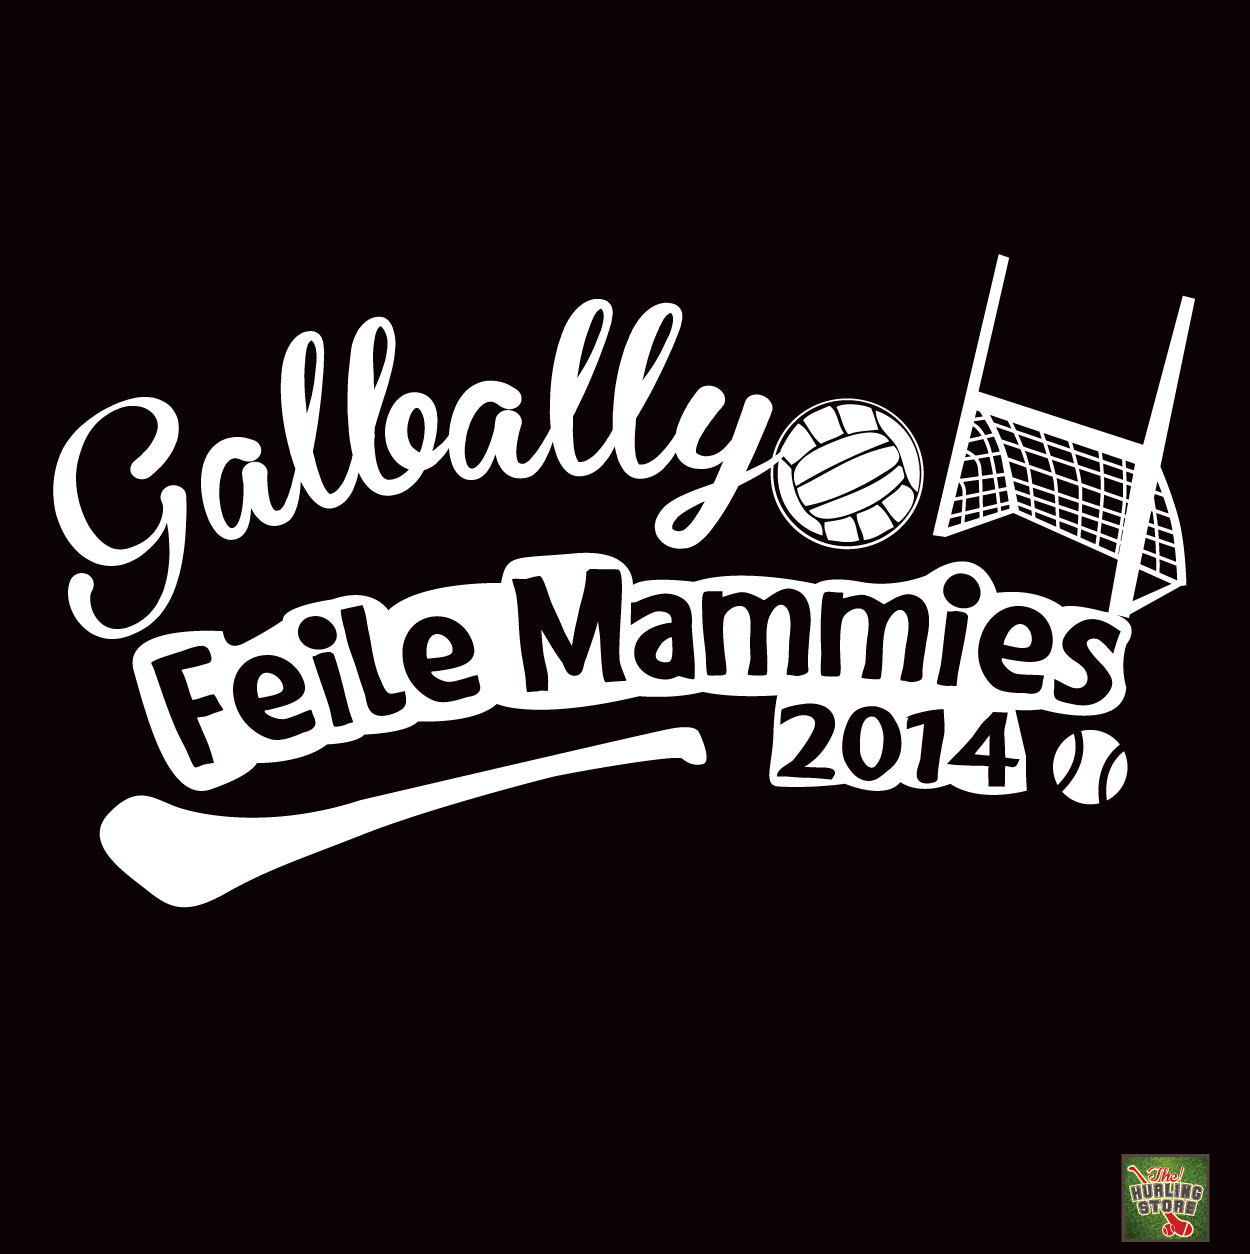 Galbally